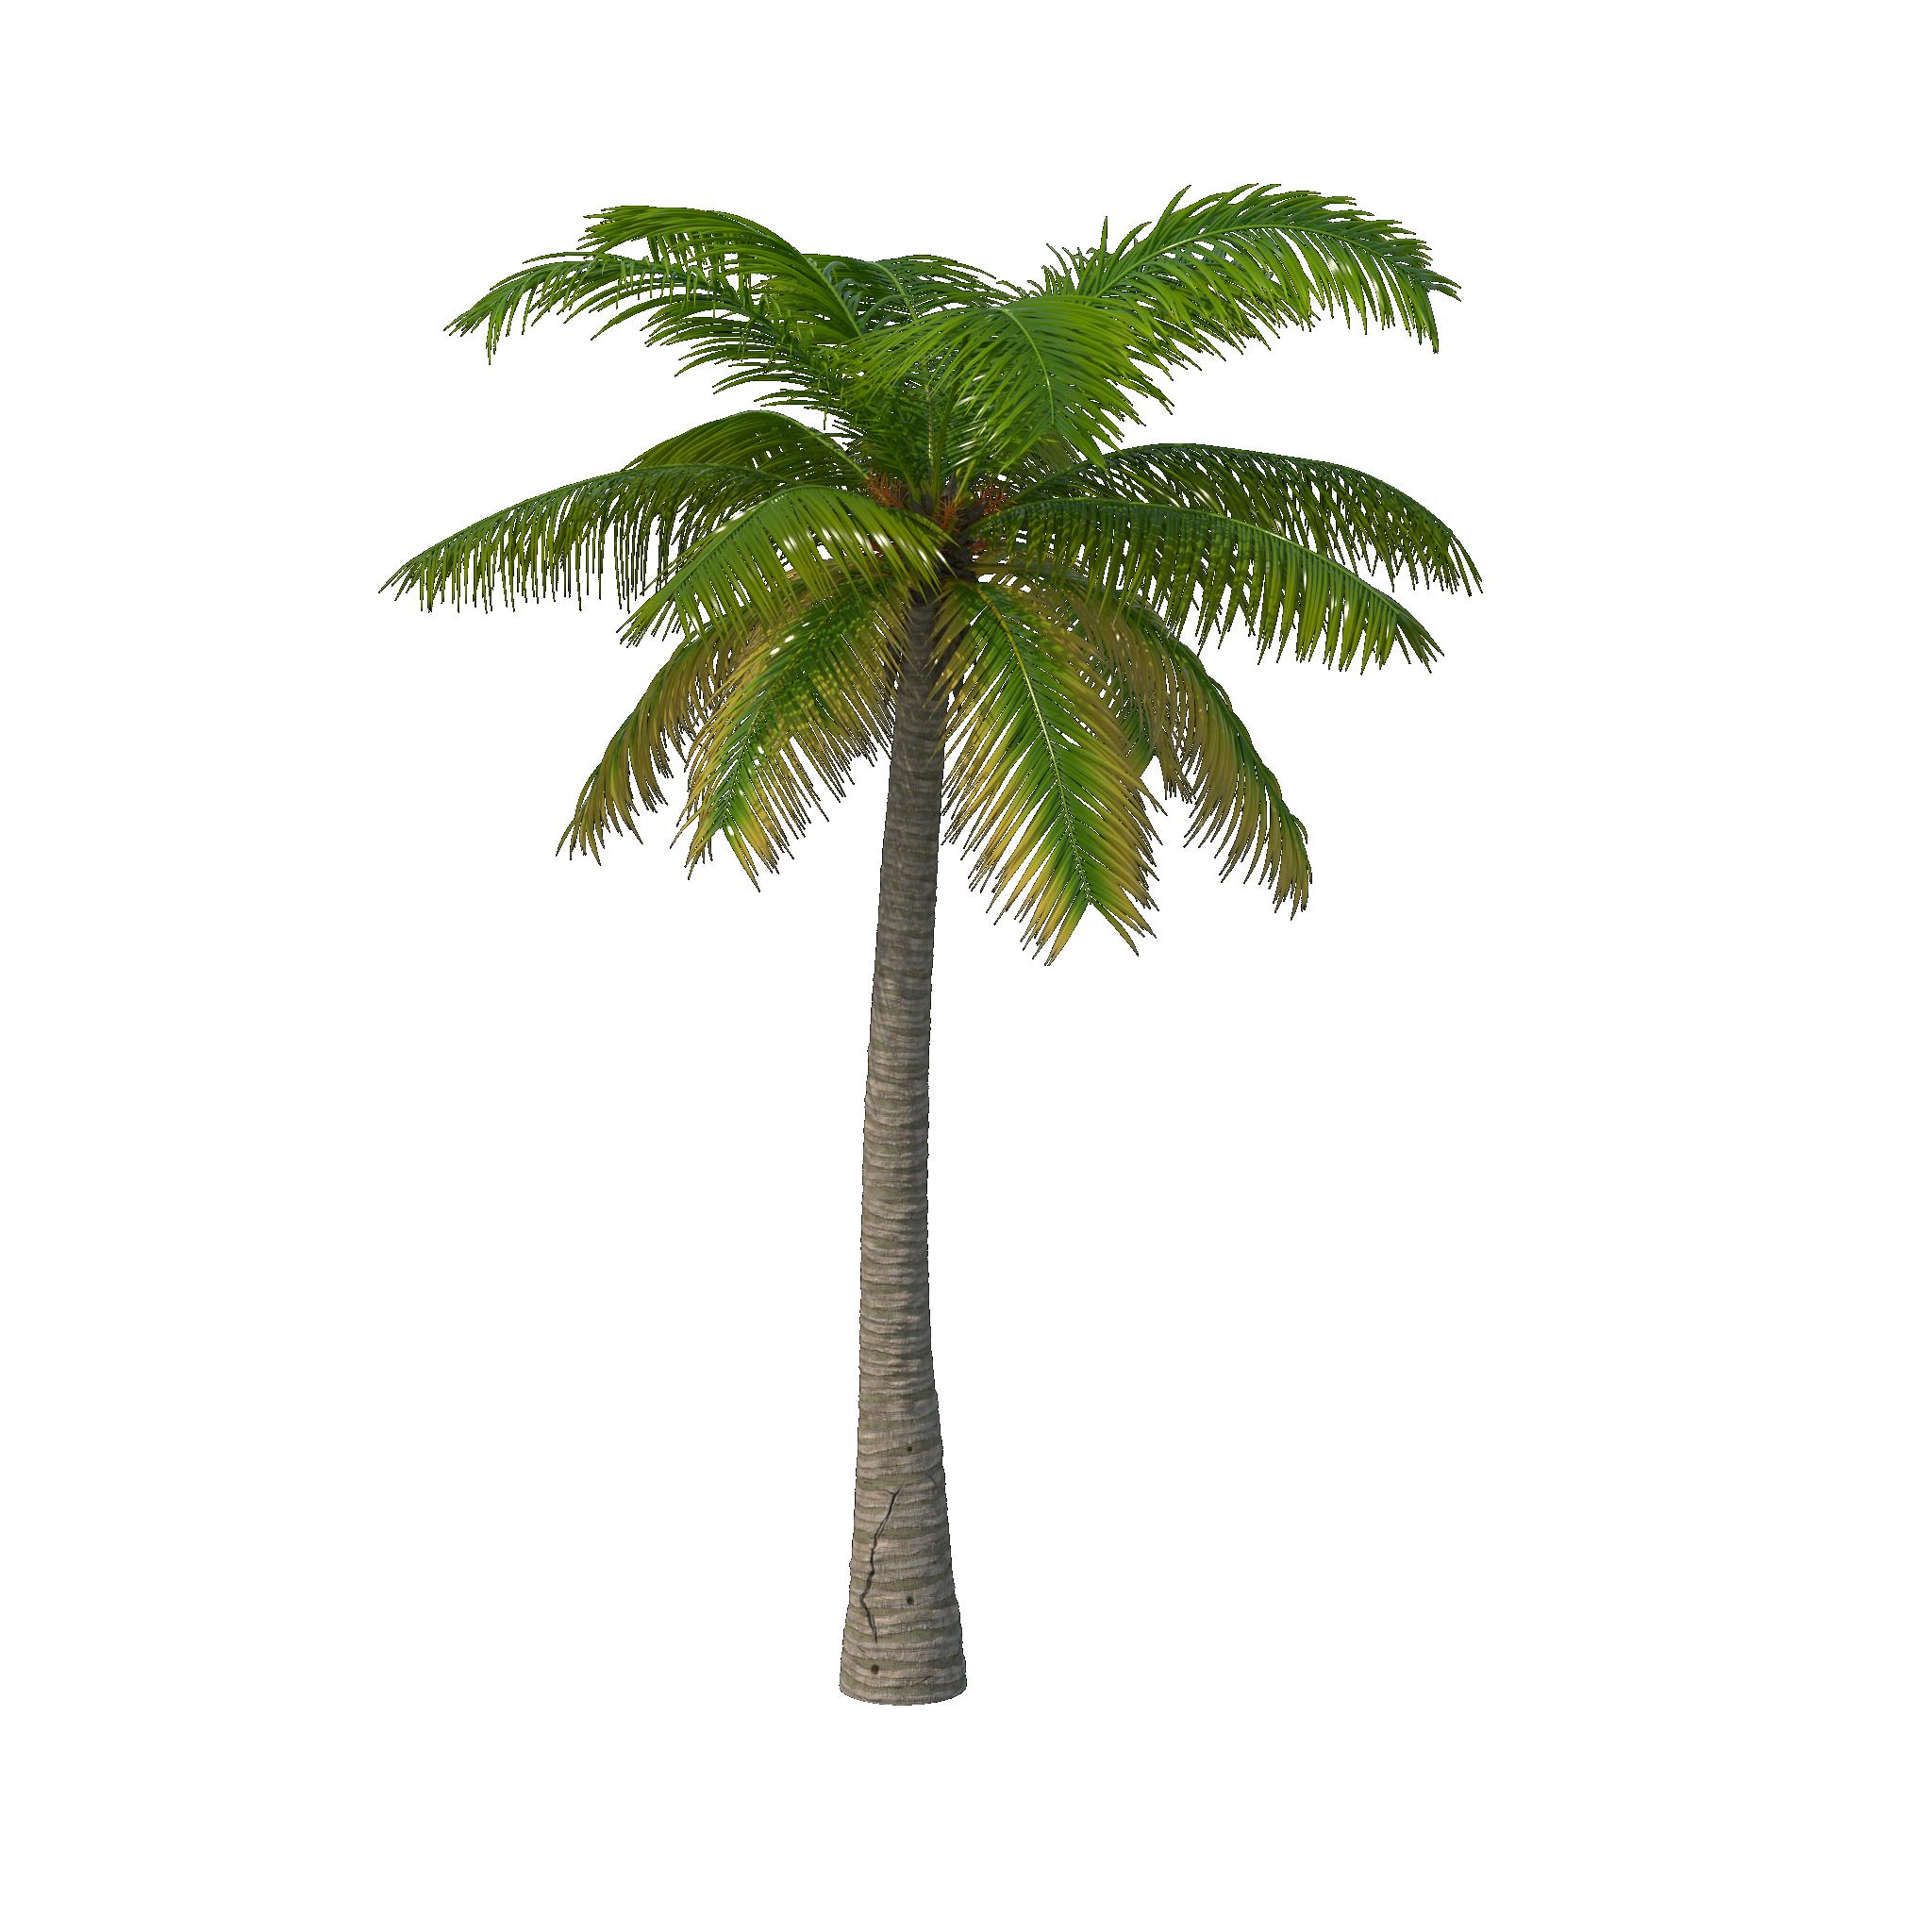 Palm Tree PNG Image | Palm tree png, Palm tree drawing ...